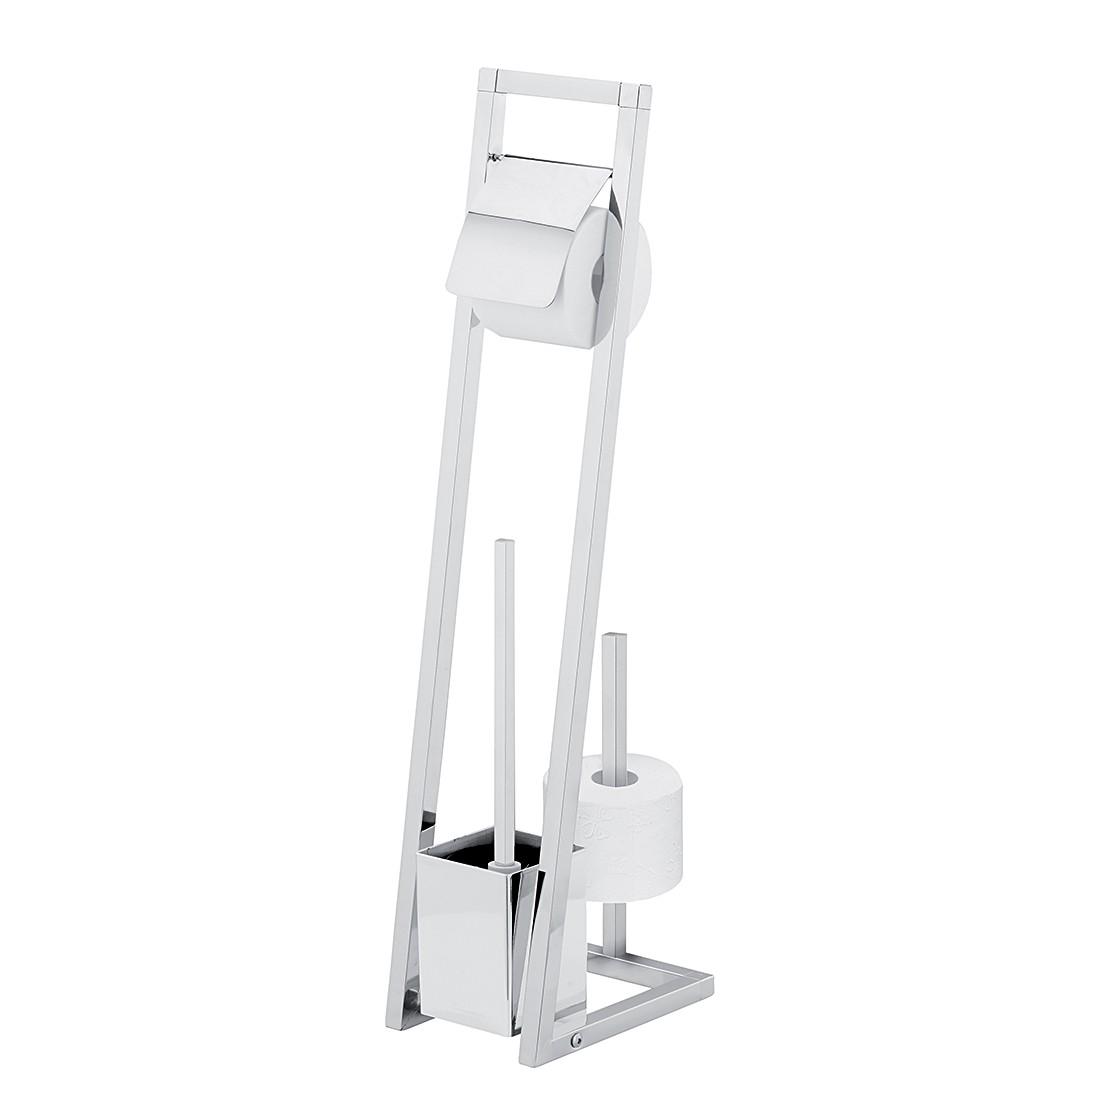 WC-Garnitur Kubus II – Chrom, Sanwood günstig bestellen